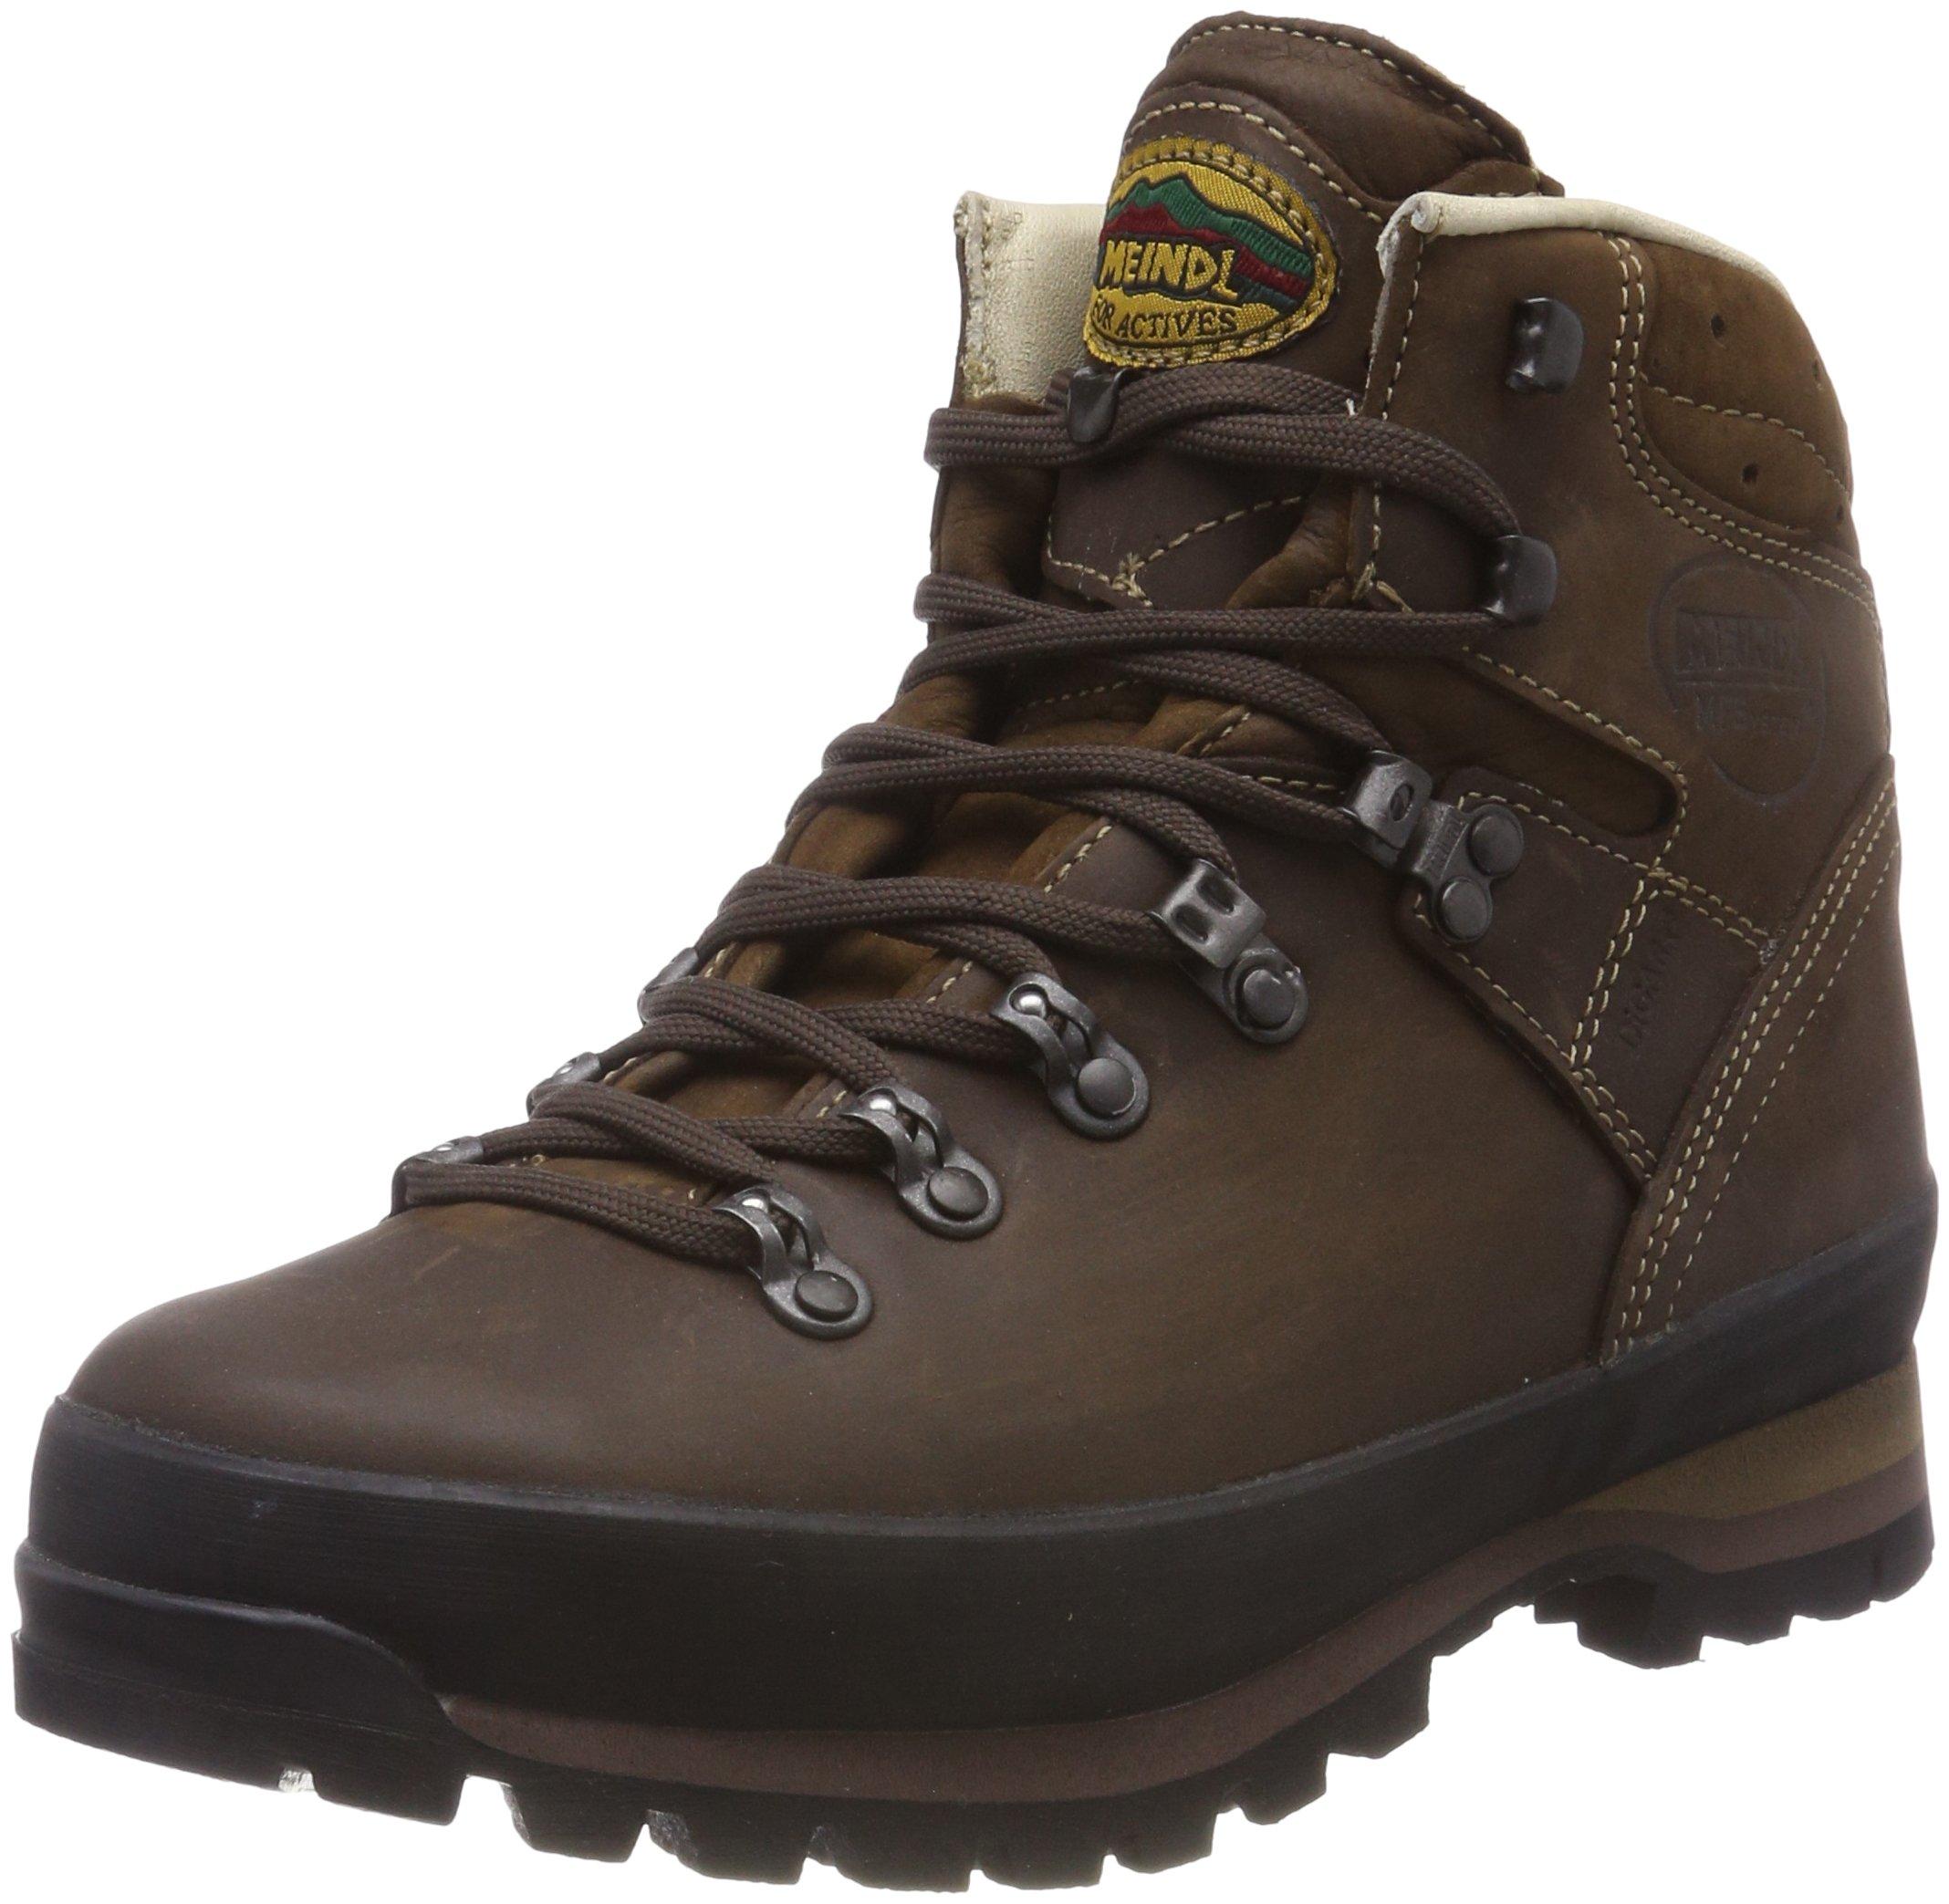 81SC4u3t2KL - Meindl Women's Borneo Lady 2 MFS (XL) High Rise Hiking Shoes